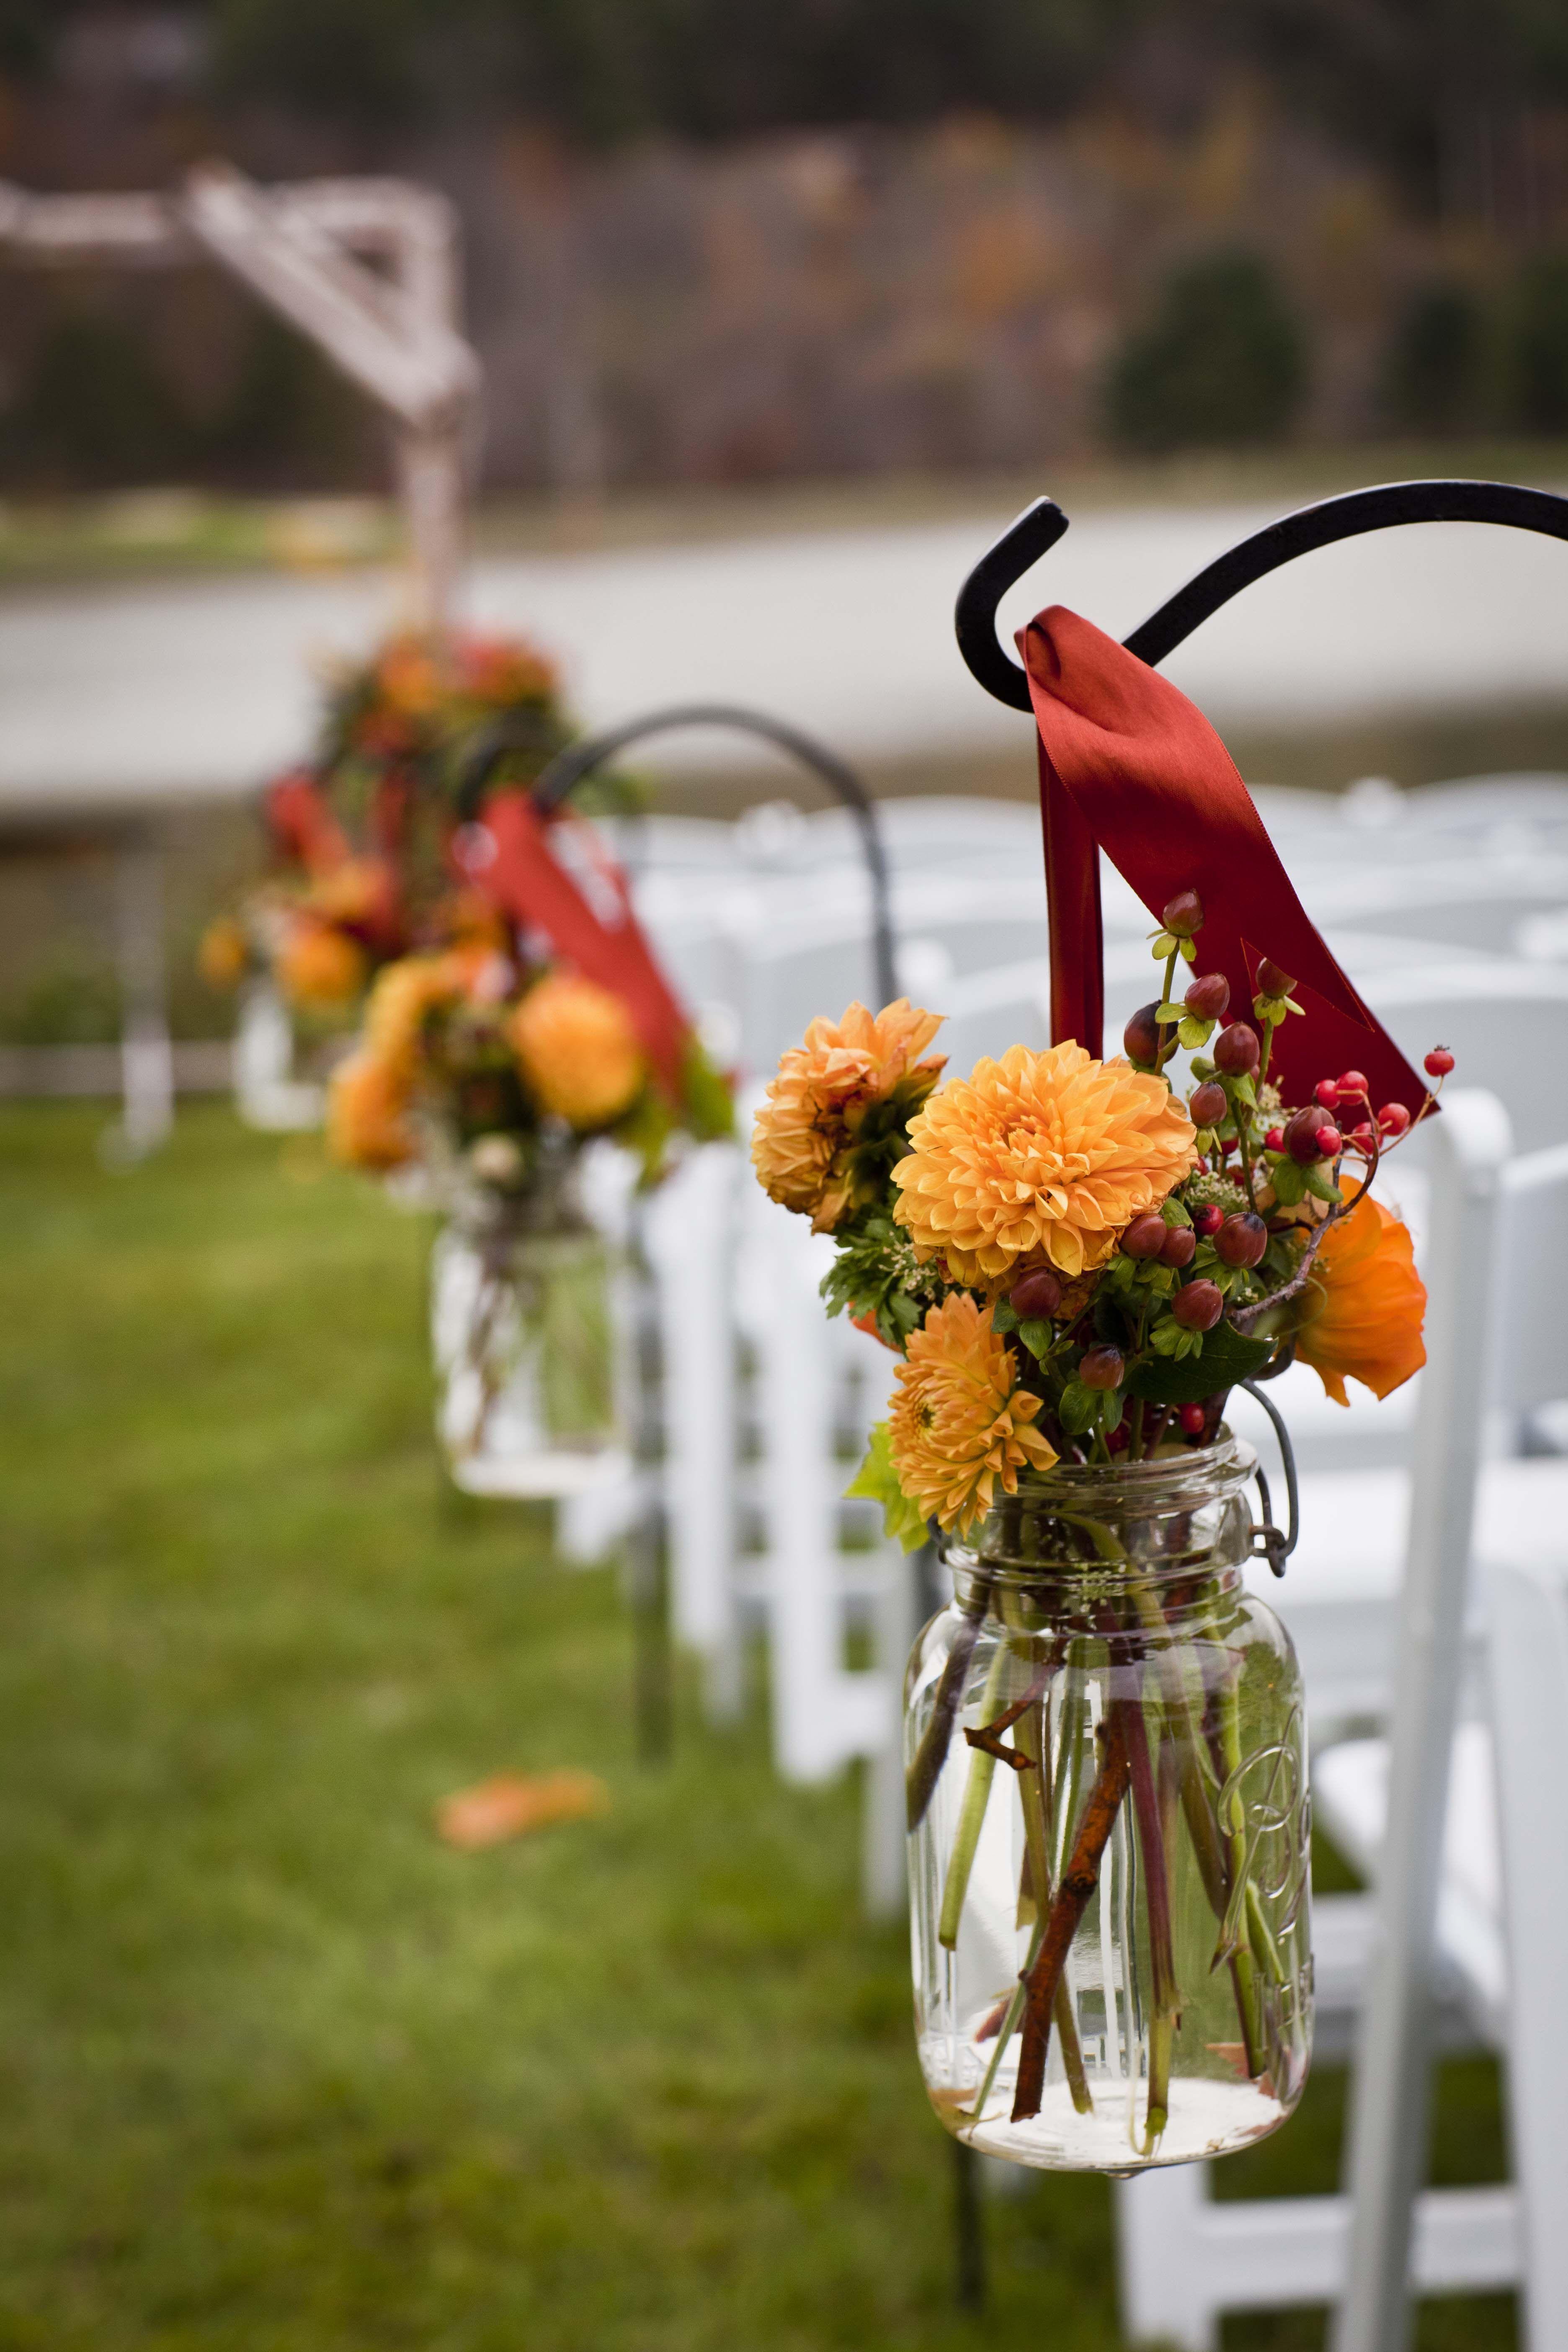 #vermont #isledecor #wedding #fall -gerber daisies with black bow around